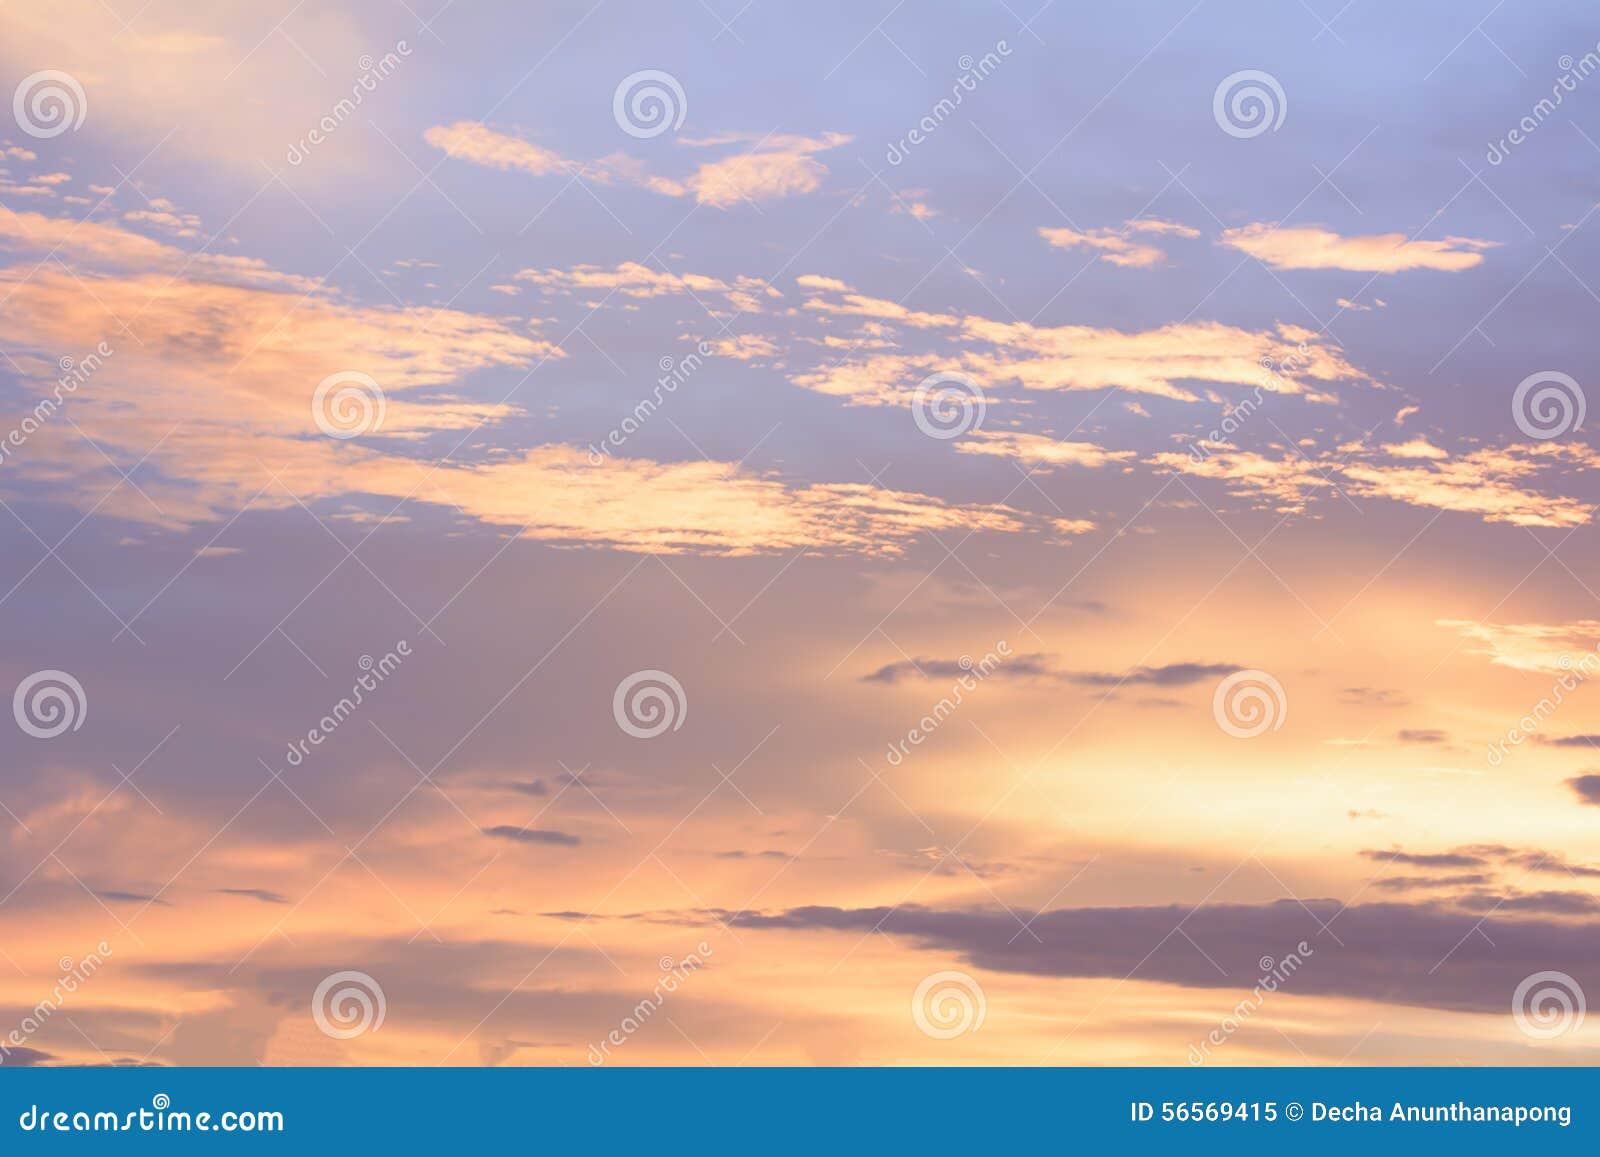 Download Ο χρυσός ουρανός είναι πολύ όμορφος και του ήλιου ακριβώς μέσα Στοκ Εικόνα - εικόνα από δροσίστε, δέντρο: 56569415